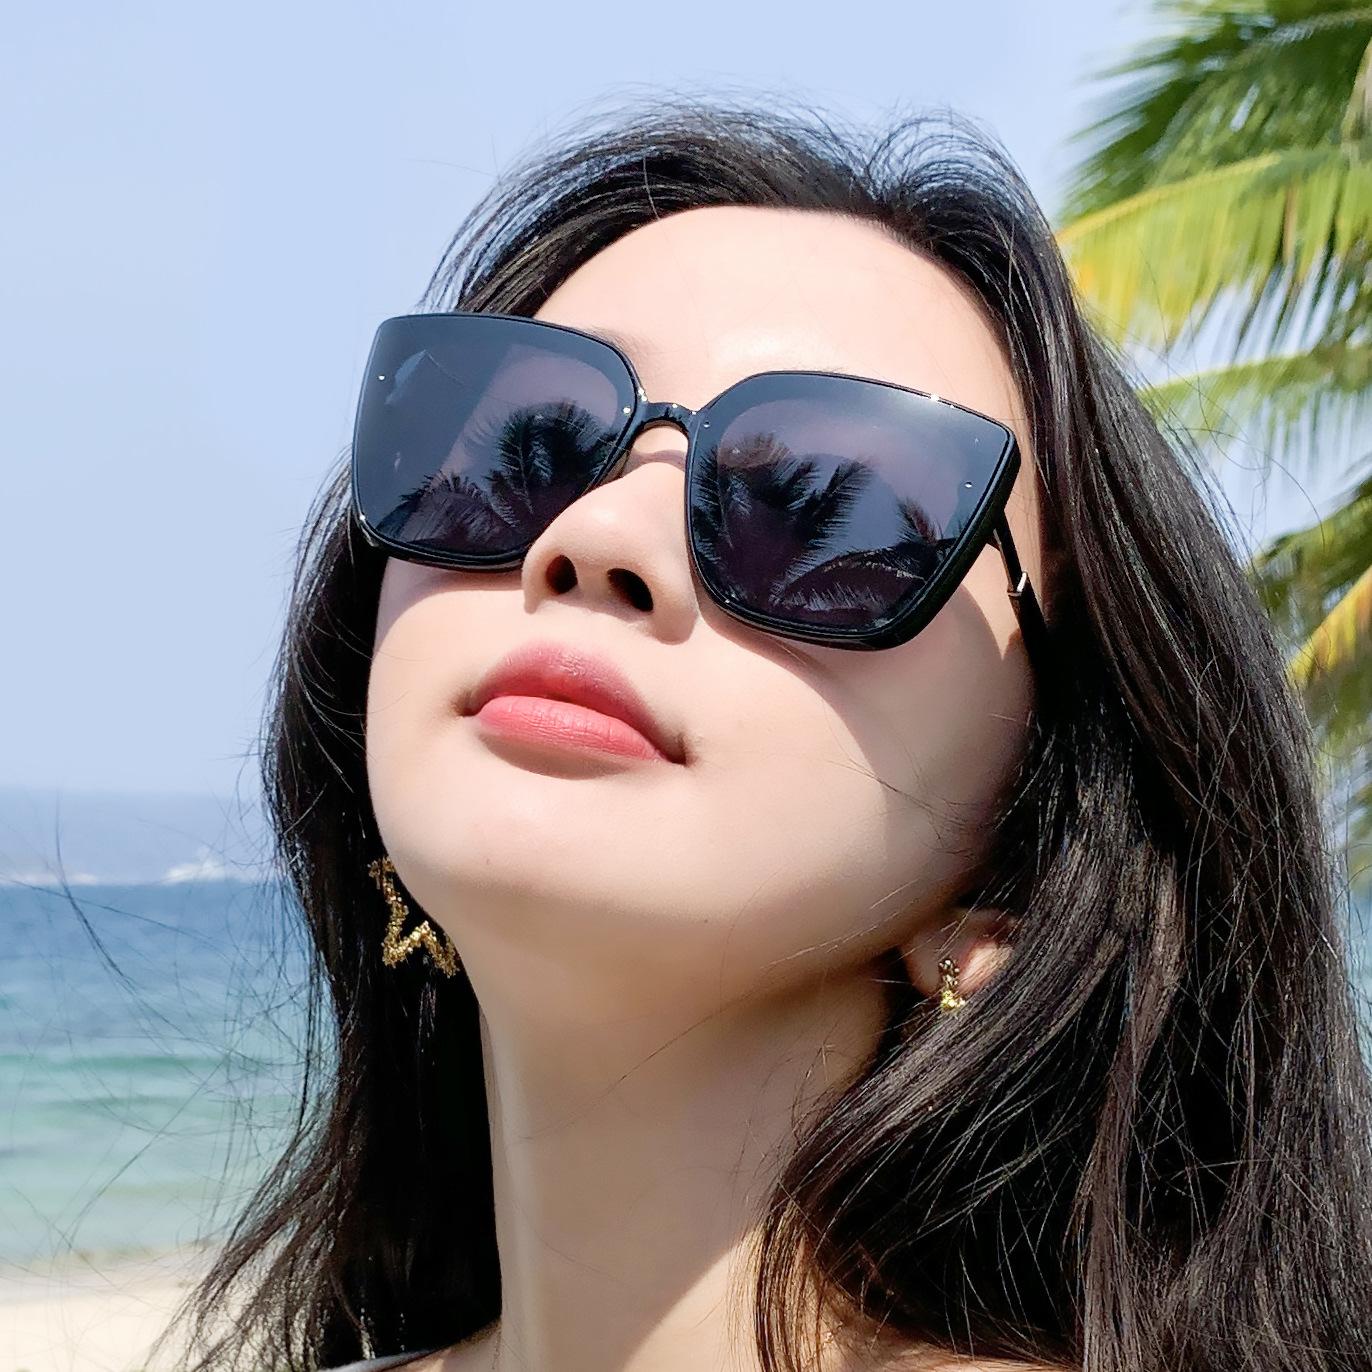 European and American sunglasses, Korean fashion 2021 new large square frame anti ultraviolet glasses, cat Shaped Sunglasses for women